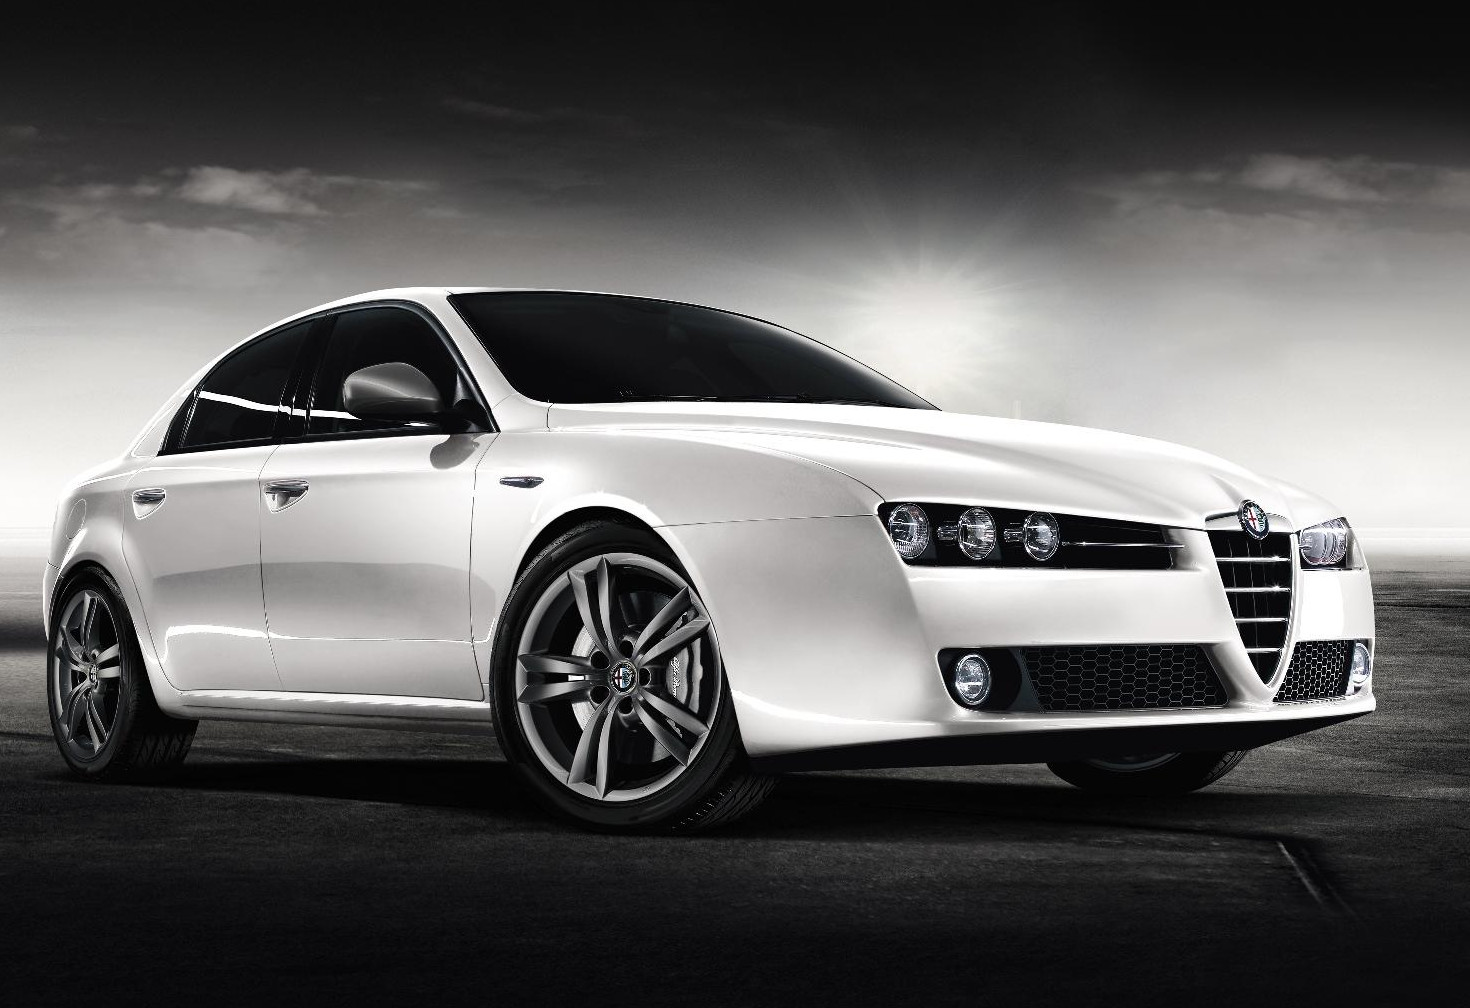 alfa romeo 159 gets new 2 0 jtdm prices start at 22 500 otr autoevolution. Black Bedroom Furniture Sets. Home Design Ideas